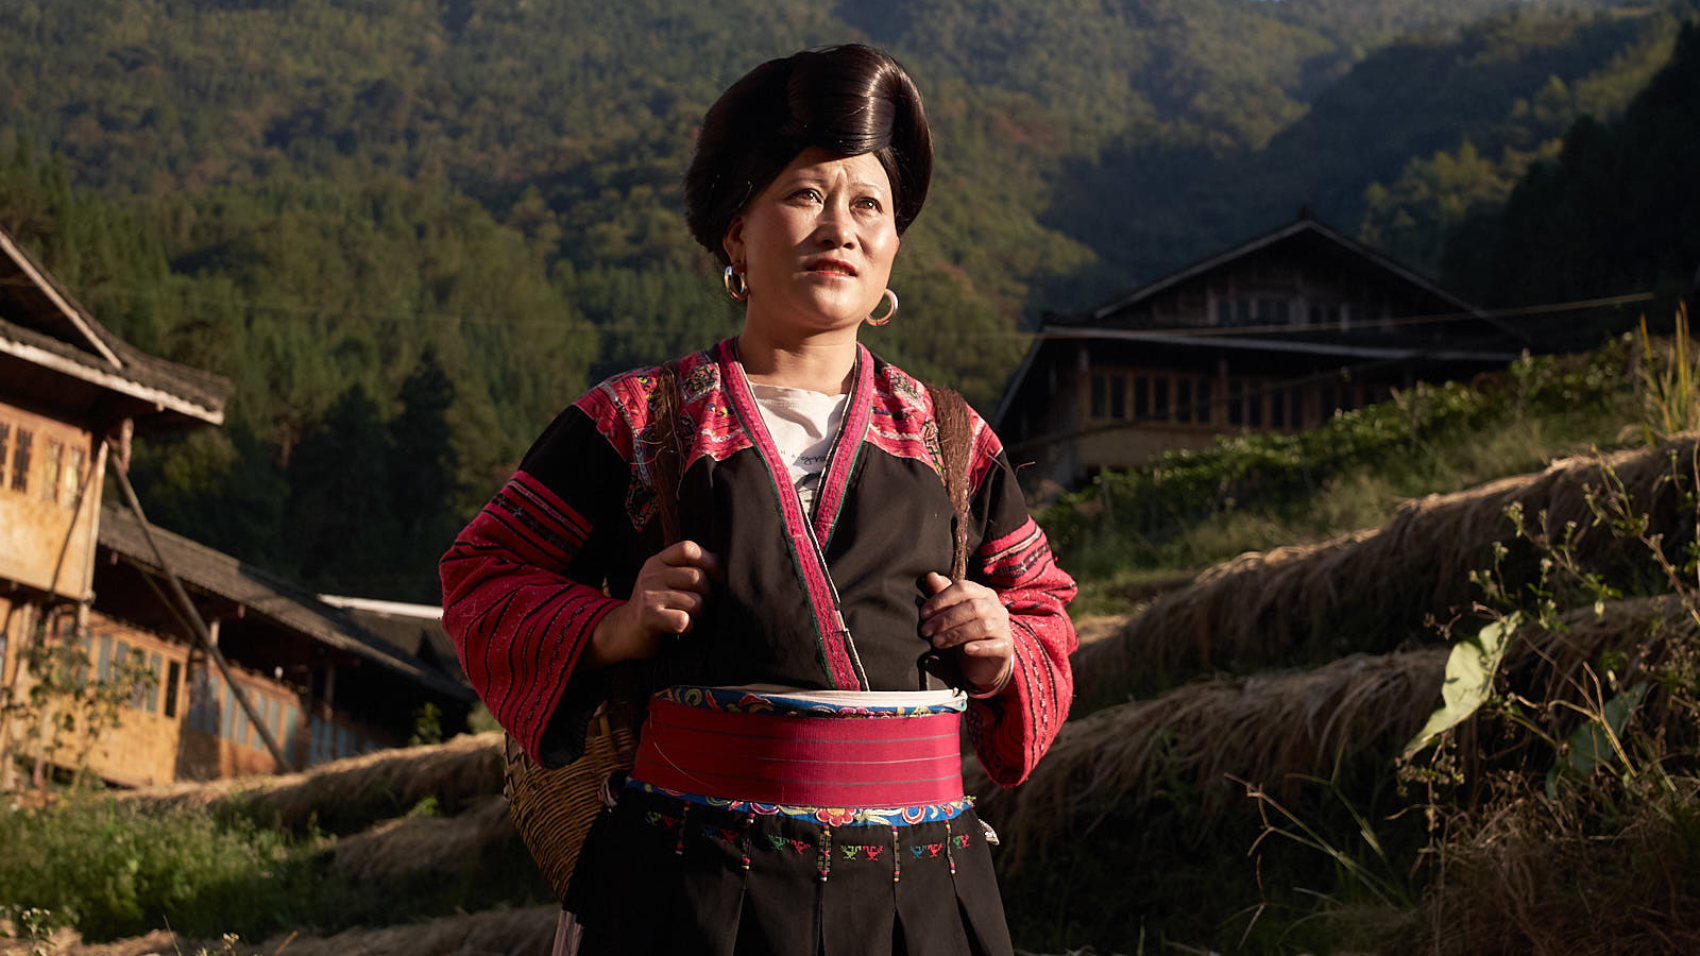 Huangluo, das Dorf der Langhaarfrauen - Dokumentation (Arte) - Yao-Frau im Reisfeld